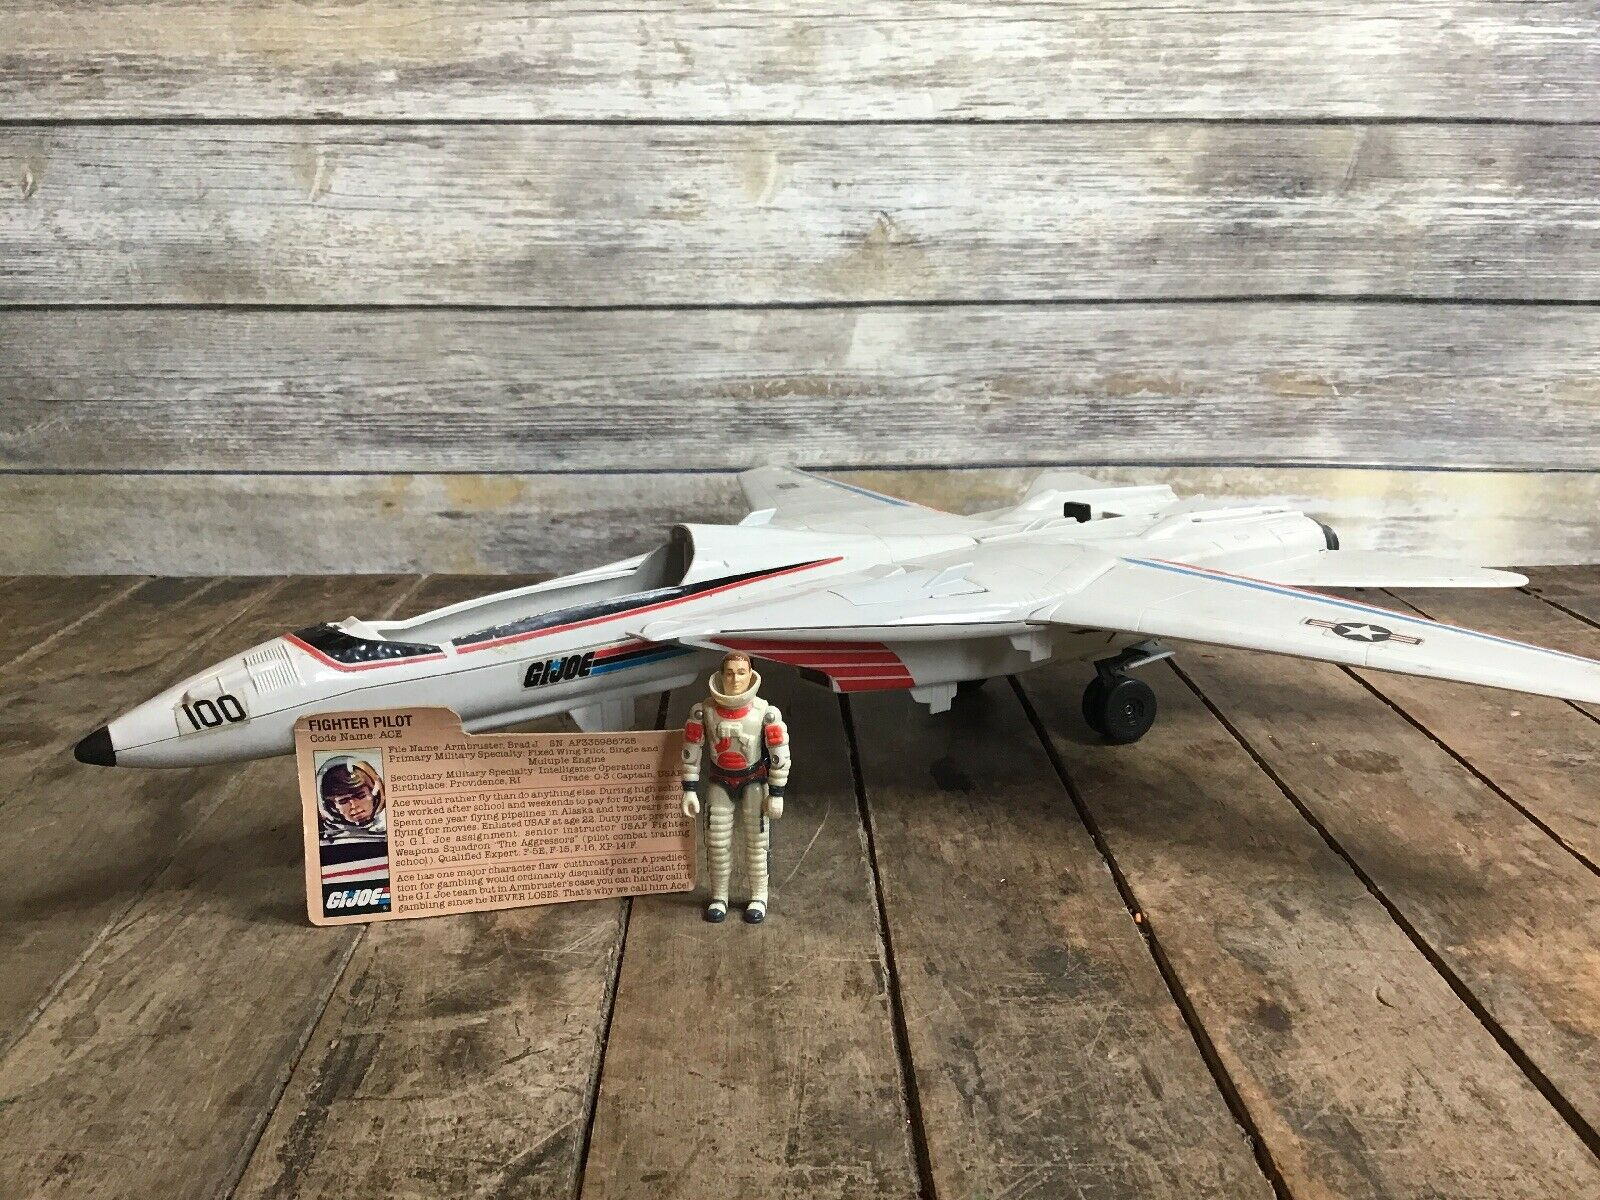 Vintage 1983 GI Joe XP14F cielo Striker Jet w Captain Ace Pilot & File autod ARAH